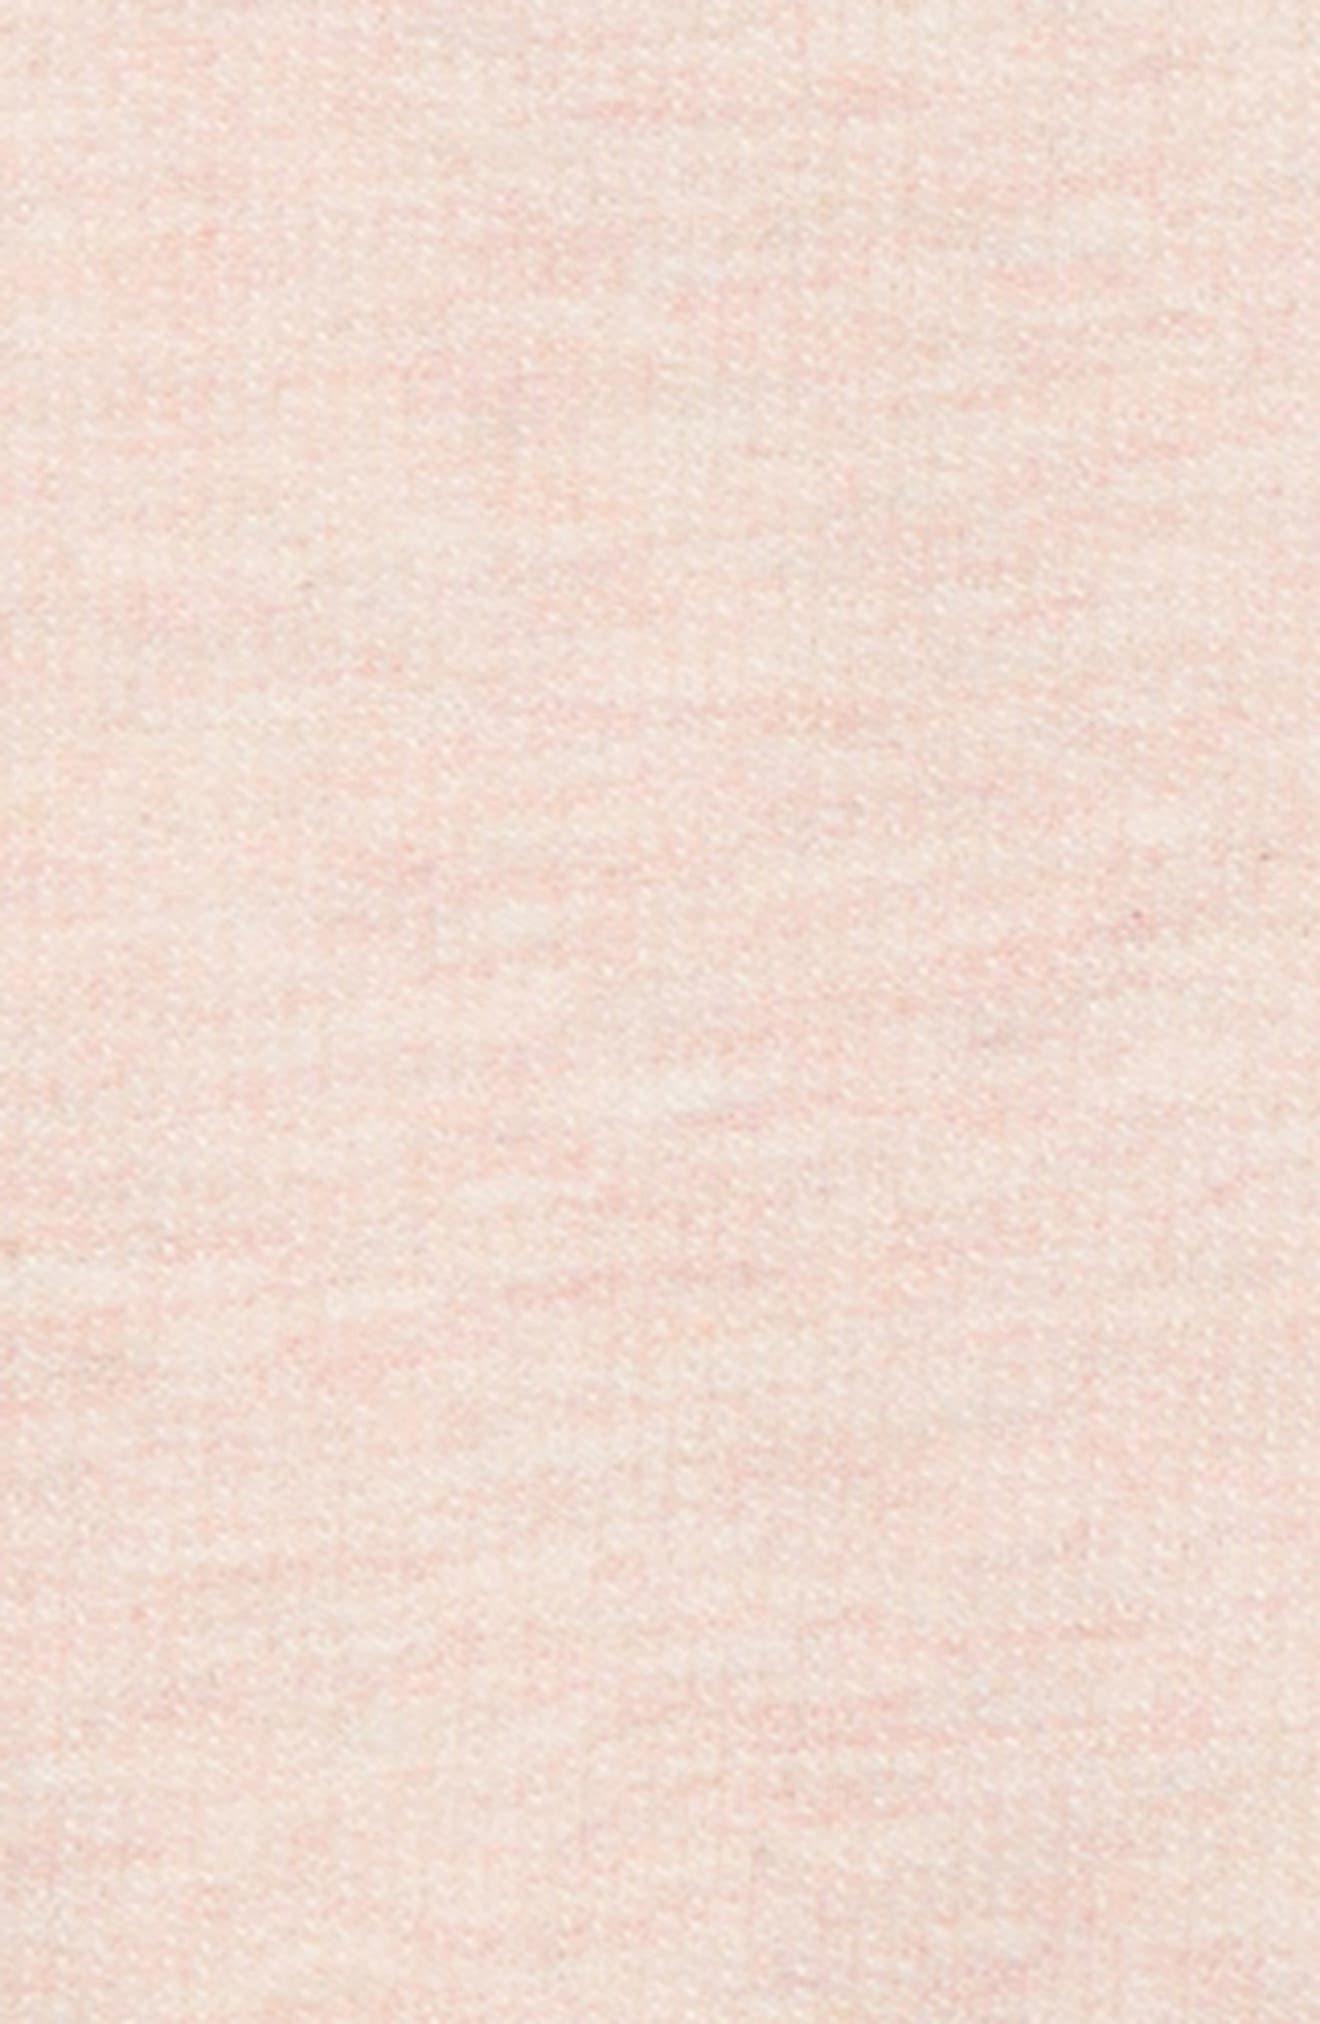 Bell Sleeve Top & Leggings Set,                             Alternate thumbnail 2, color,                             652